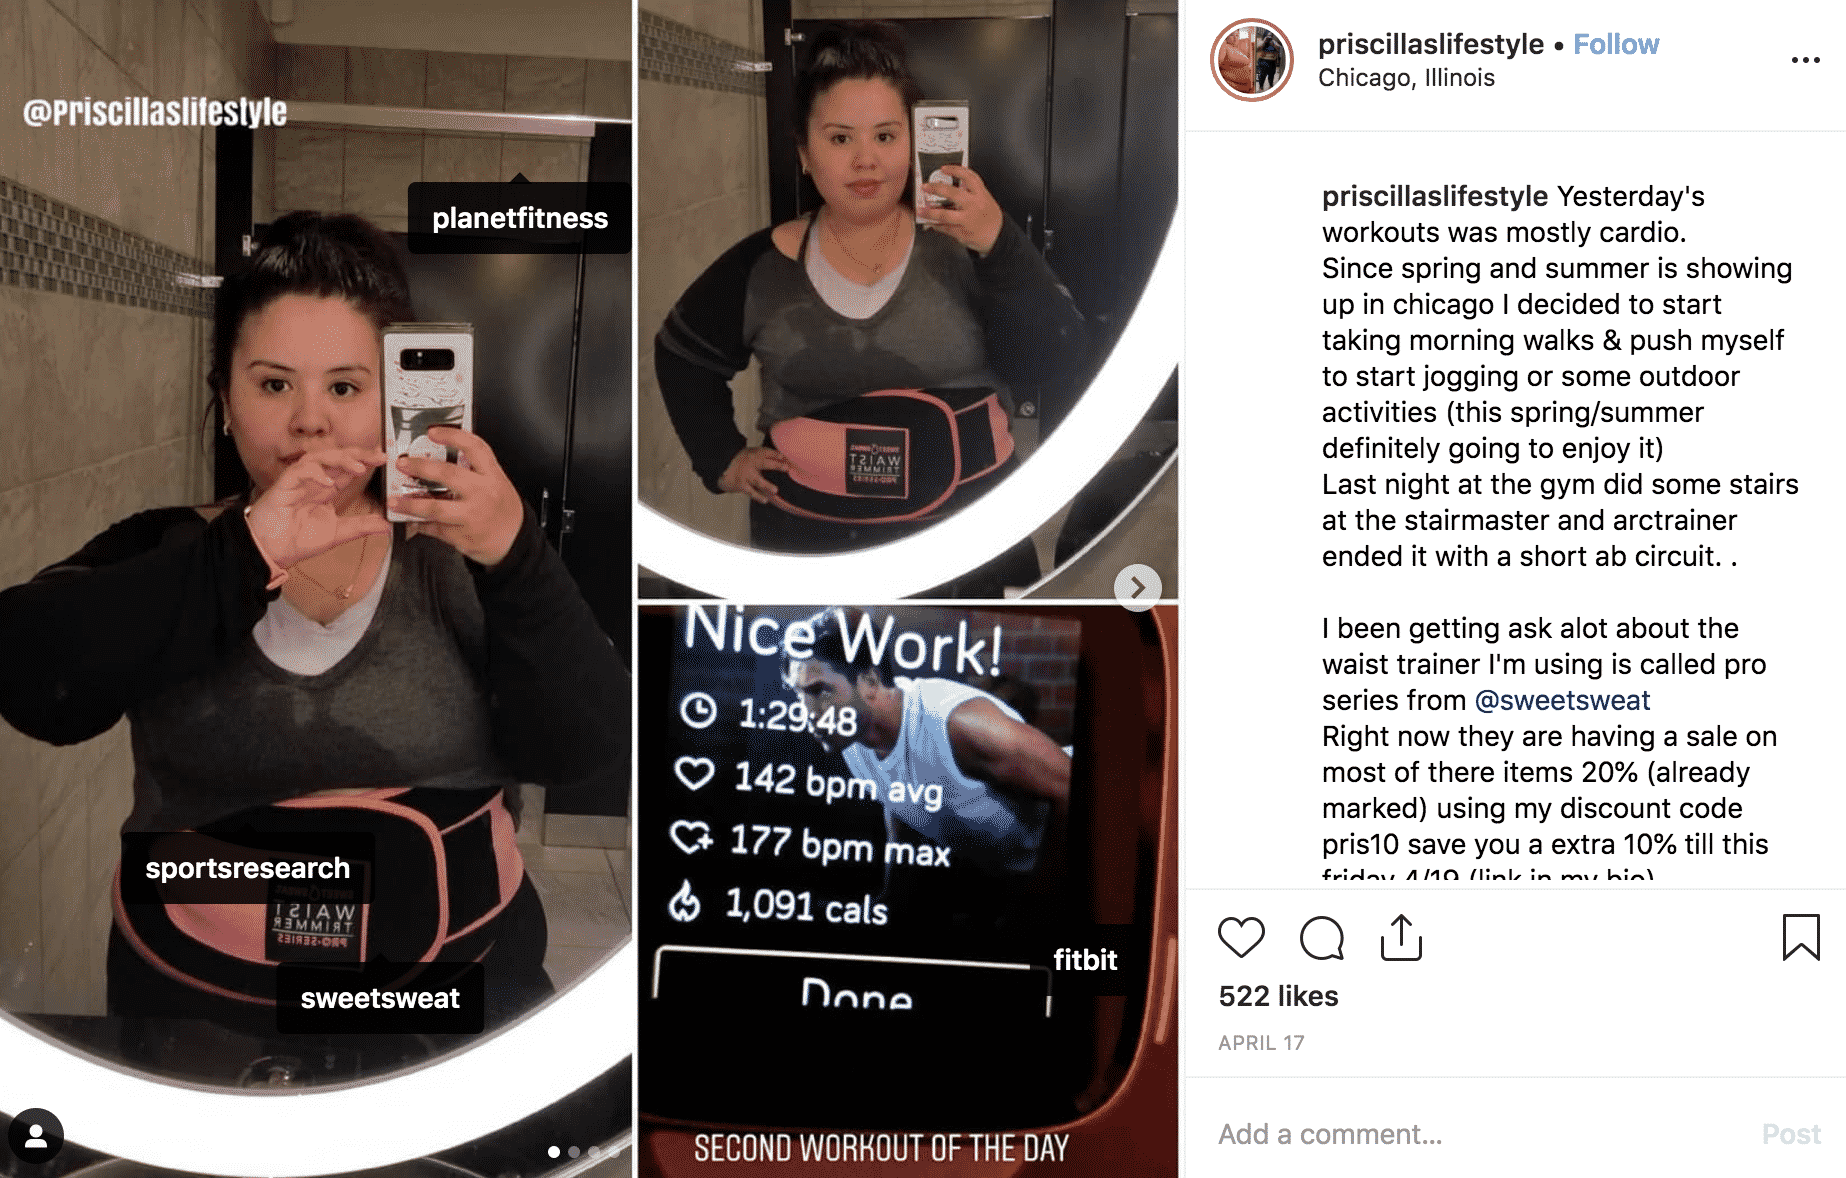 Instagraph post Sports Research Sweetsweat ambassador selfie